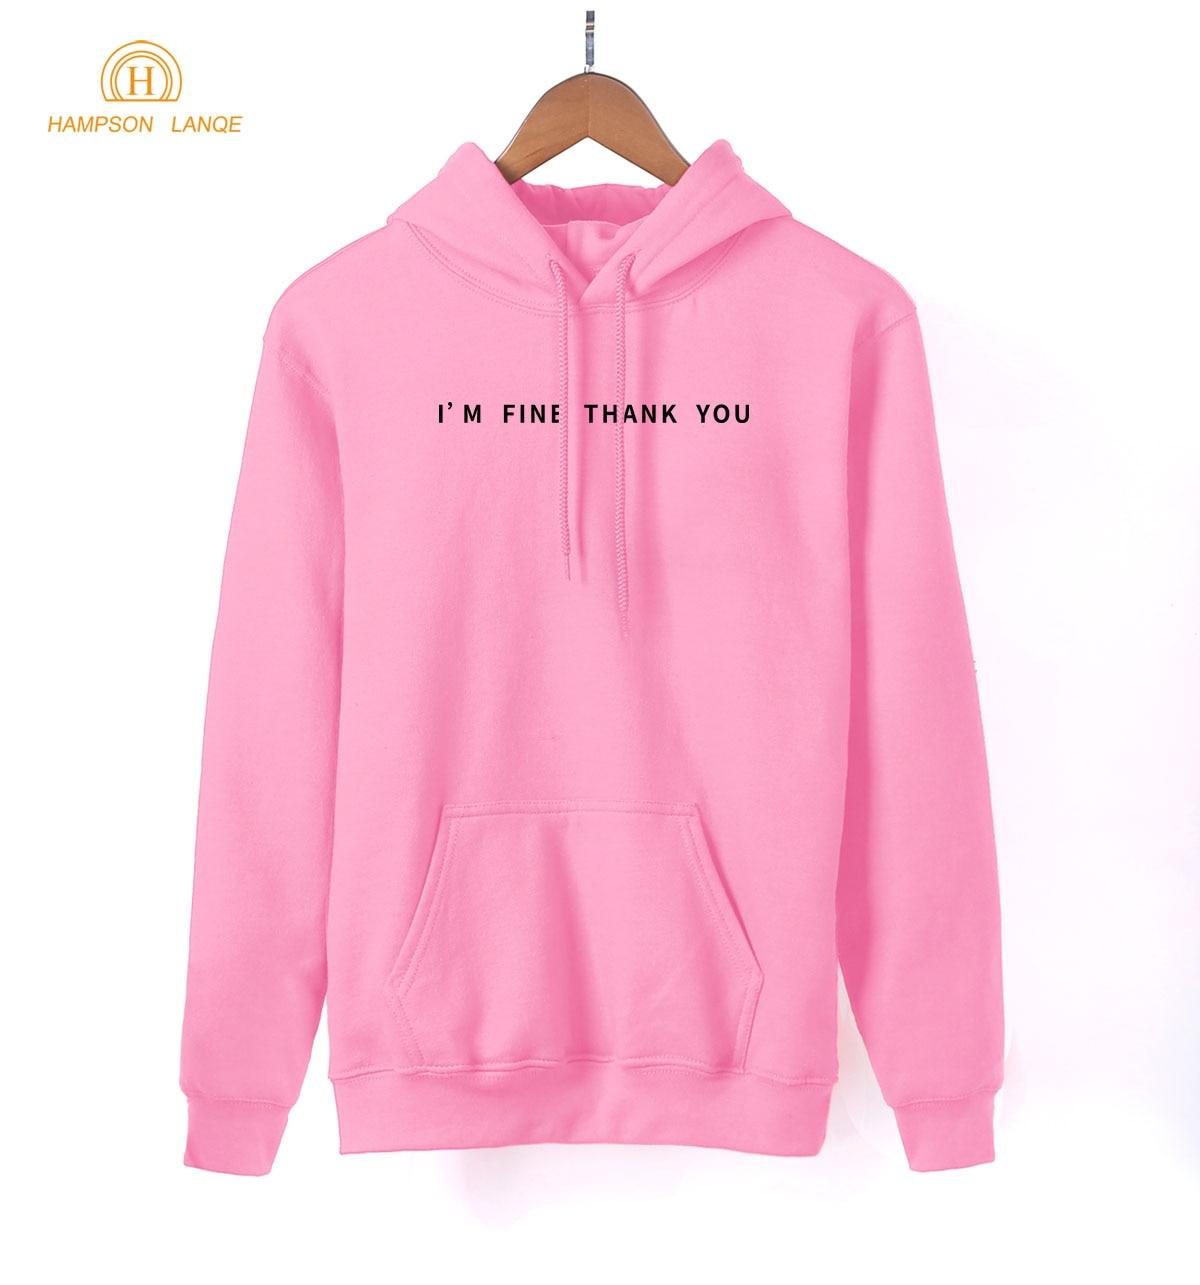 Social Hoodies Adult I'm Fine Thank You Letters Print Women Sweatshirts 2019 Spring Sweatshirt Black White Gray Pink Red Blue